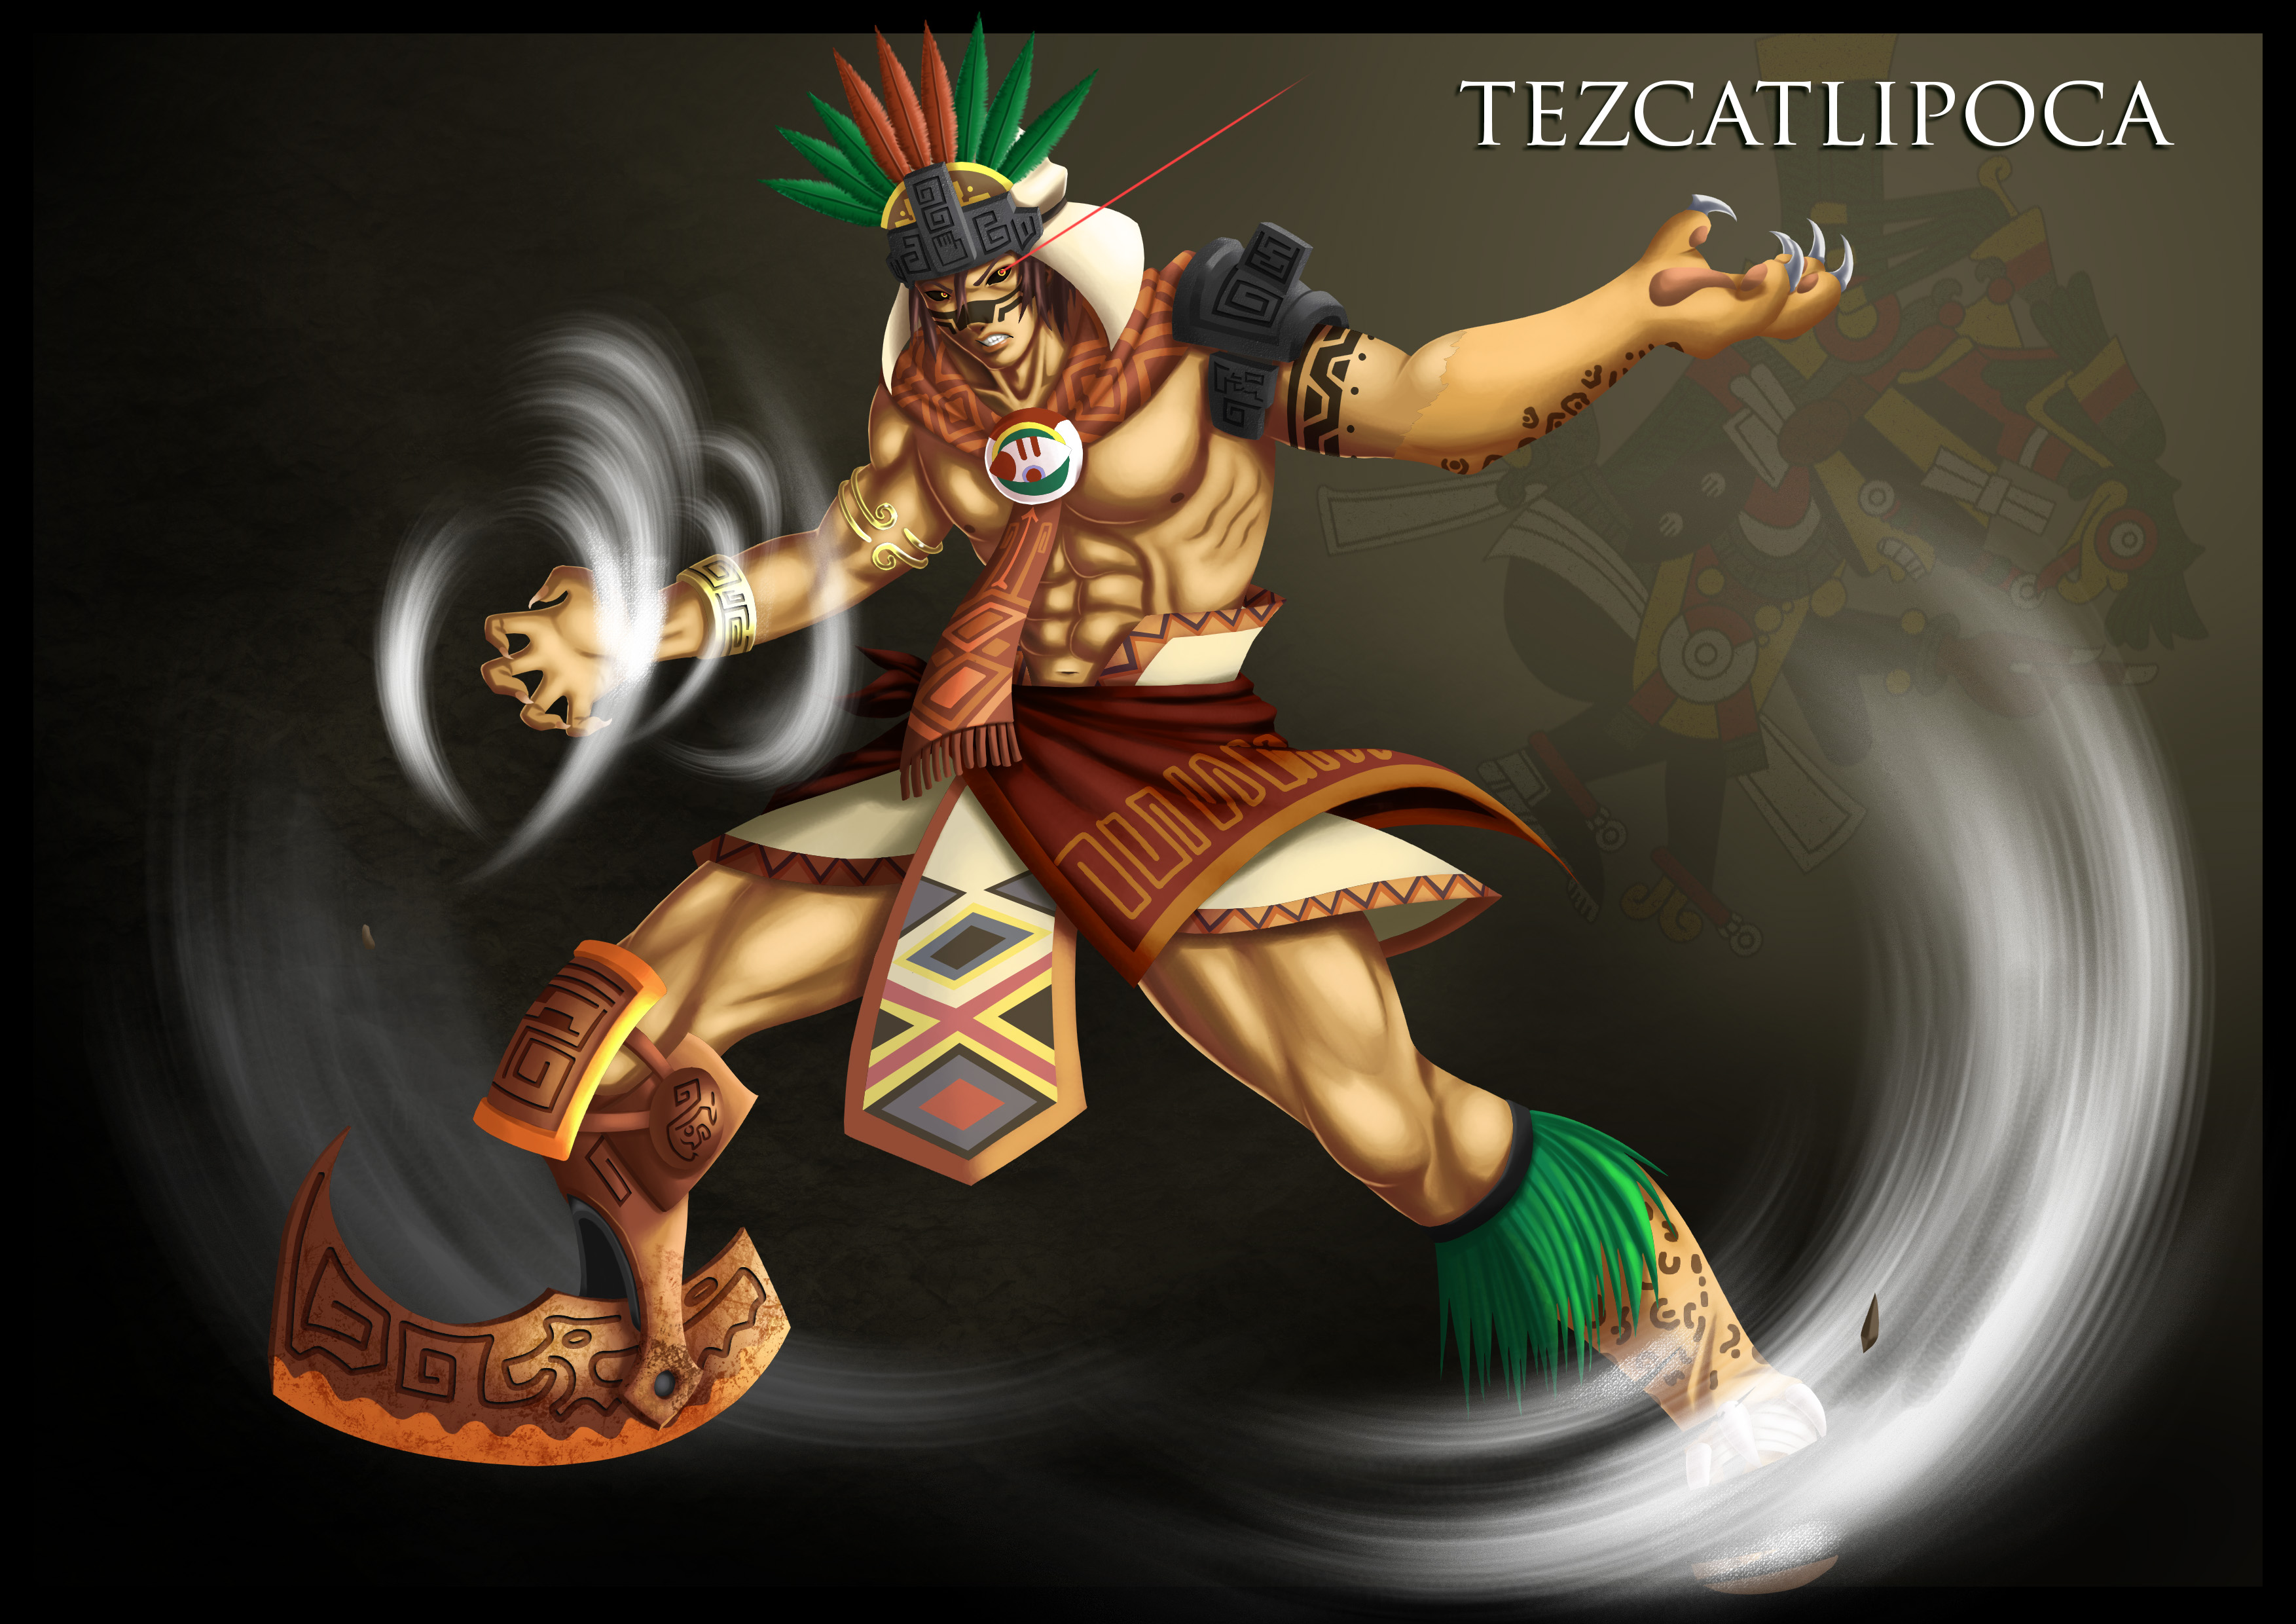 Tezcatlipoca